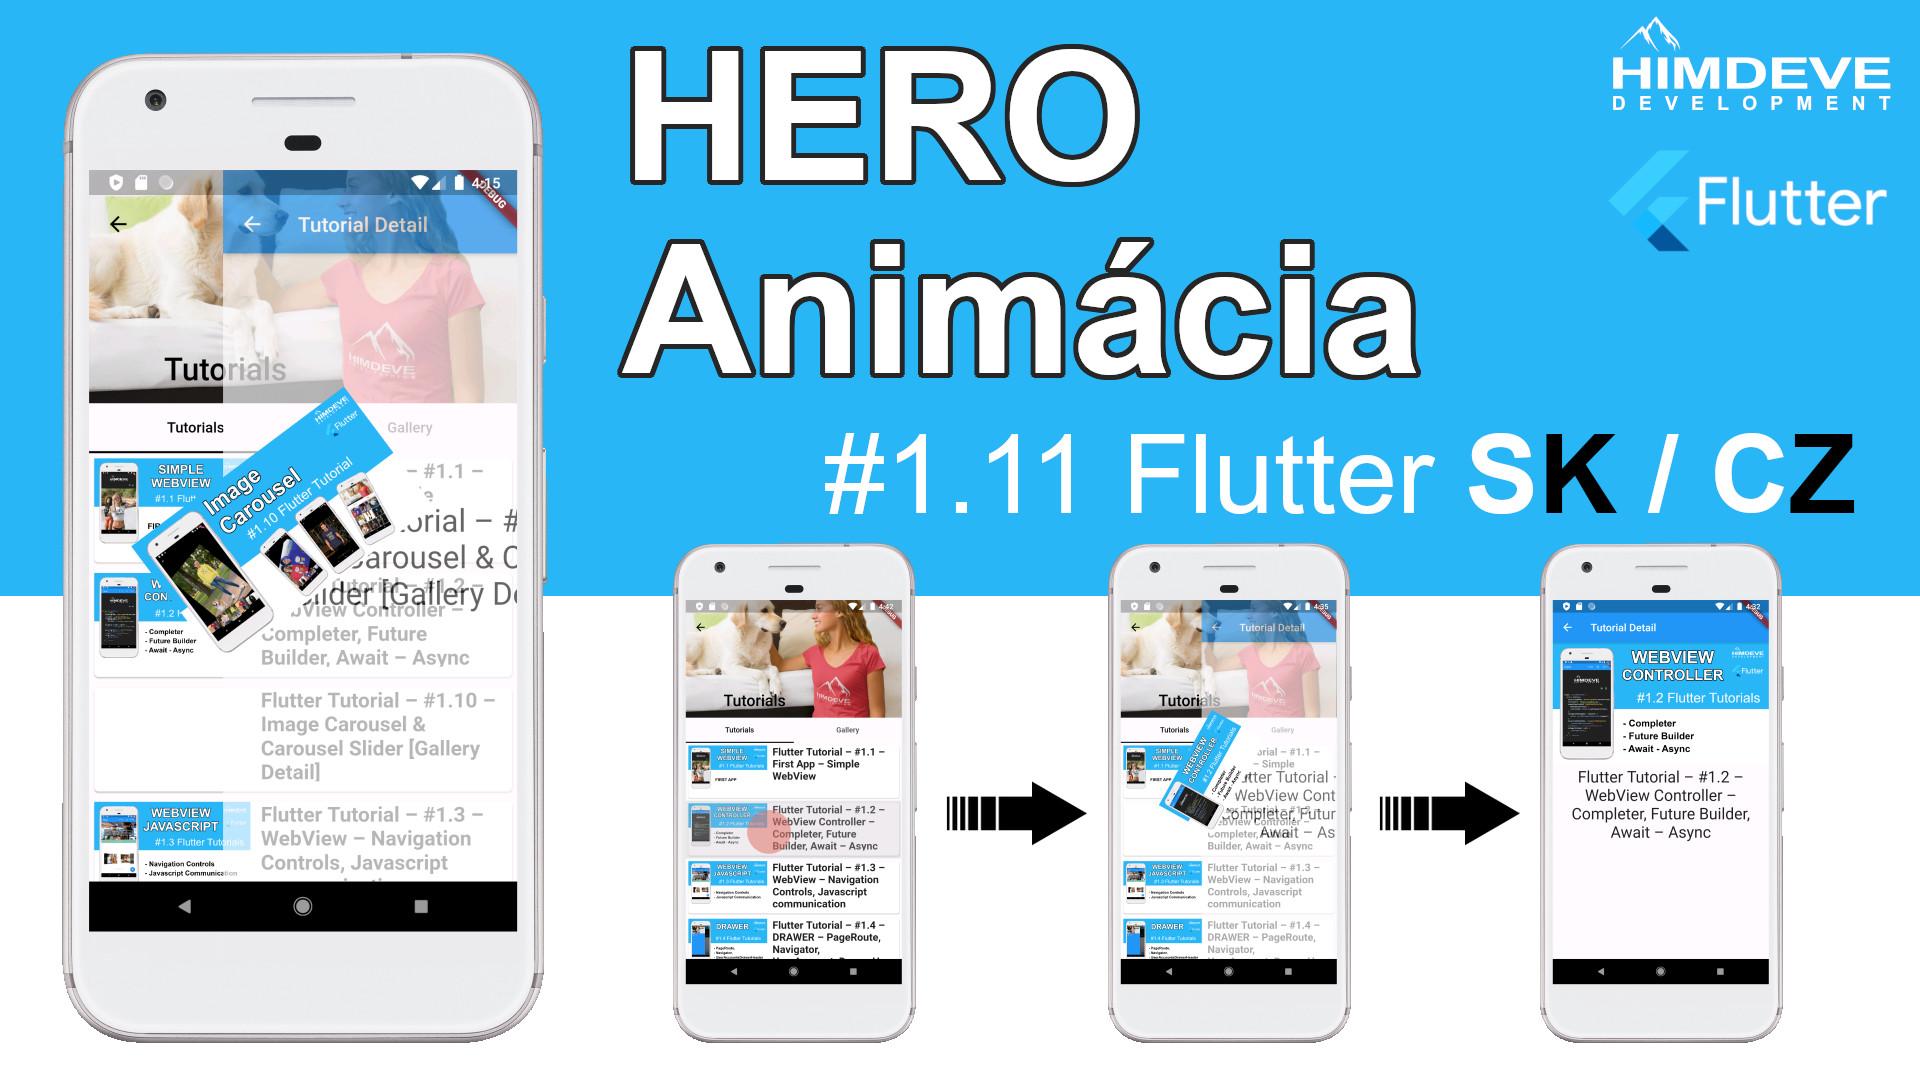 #1_11 hero animacia